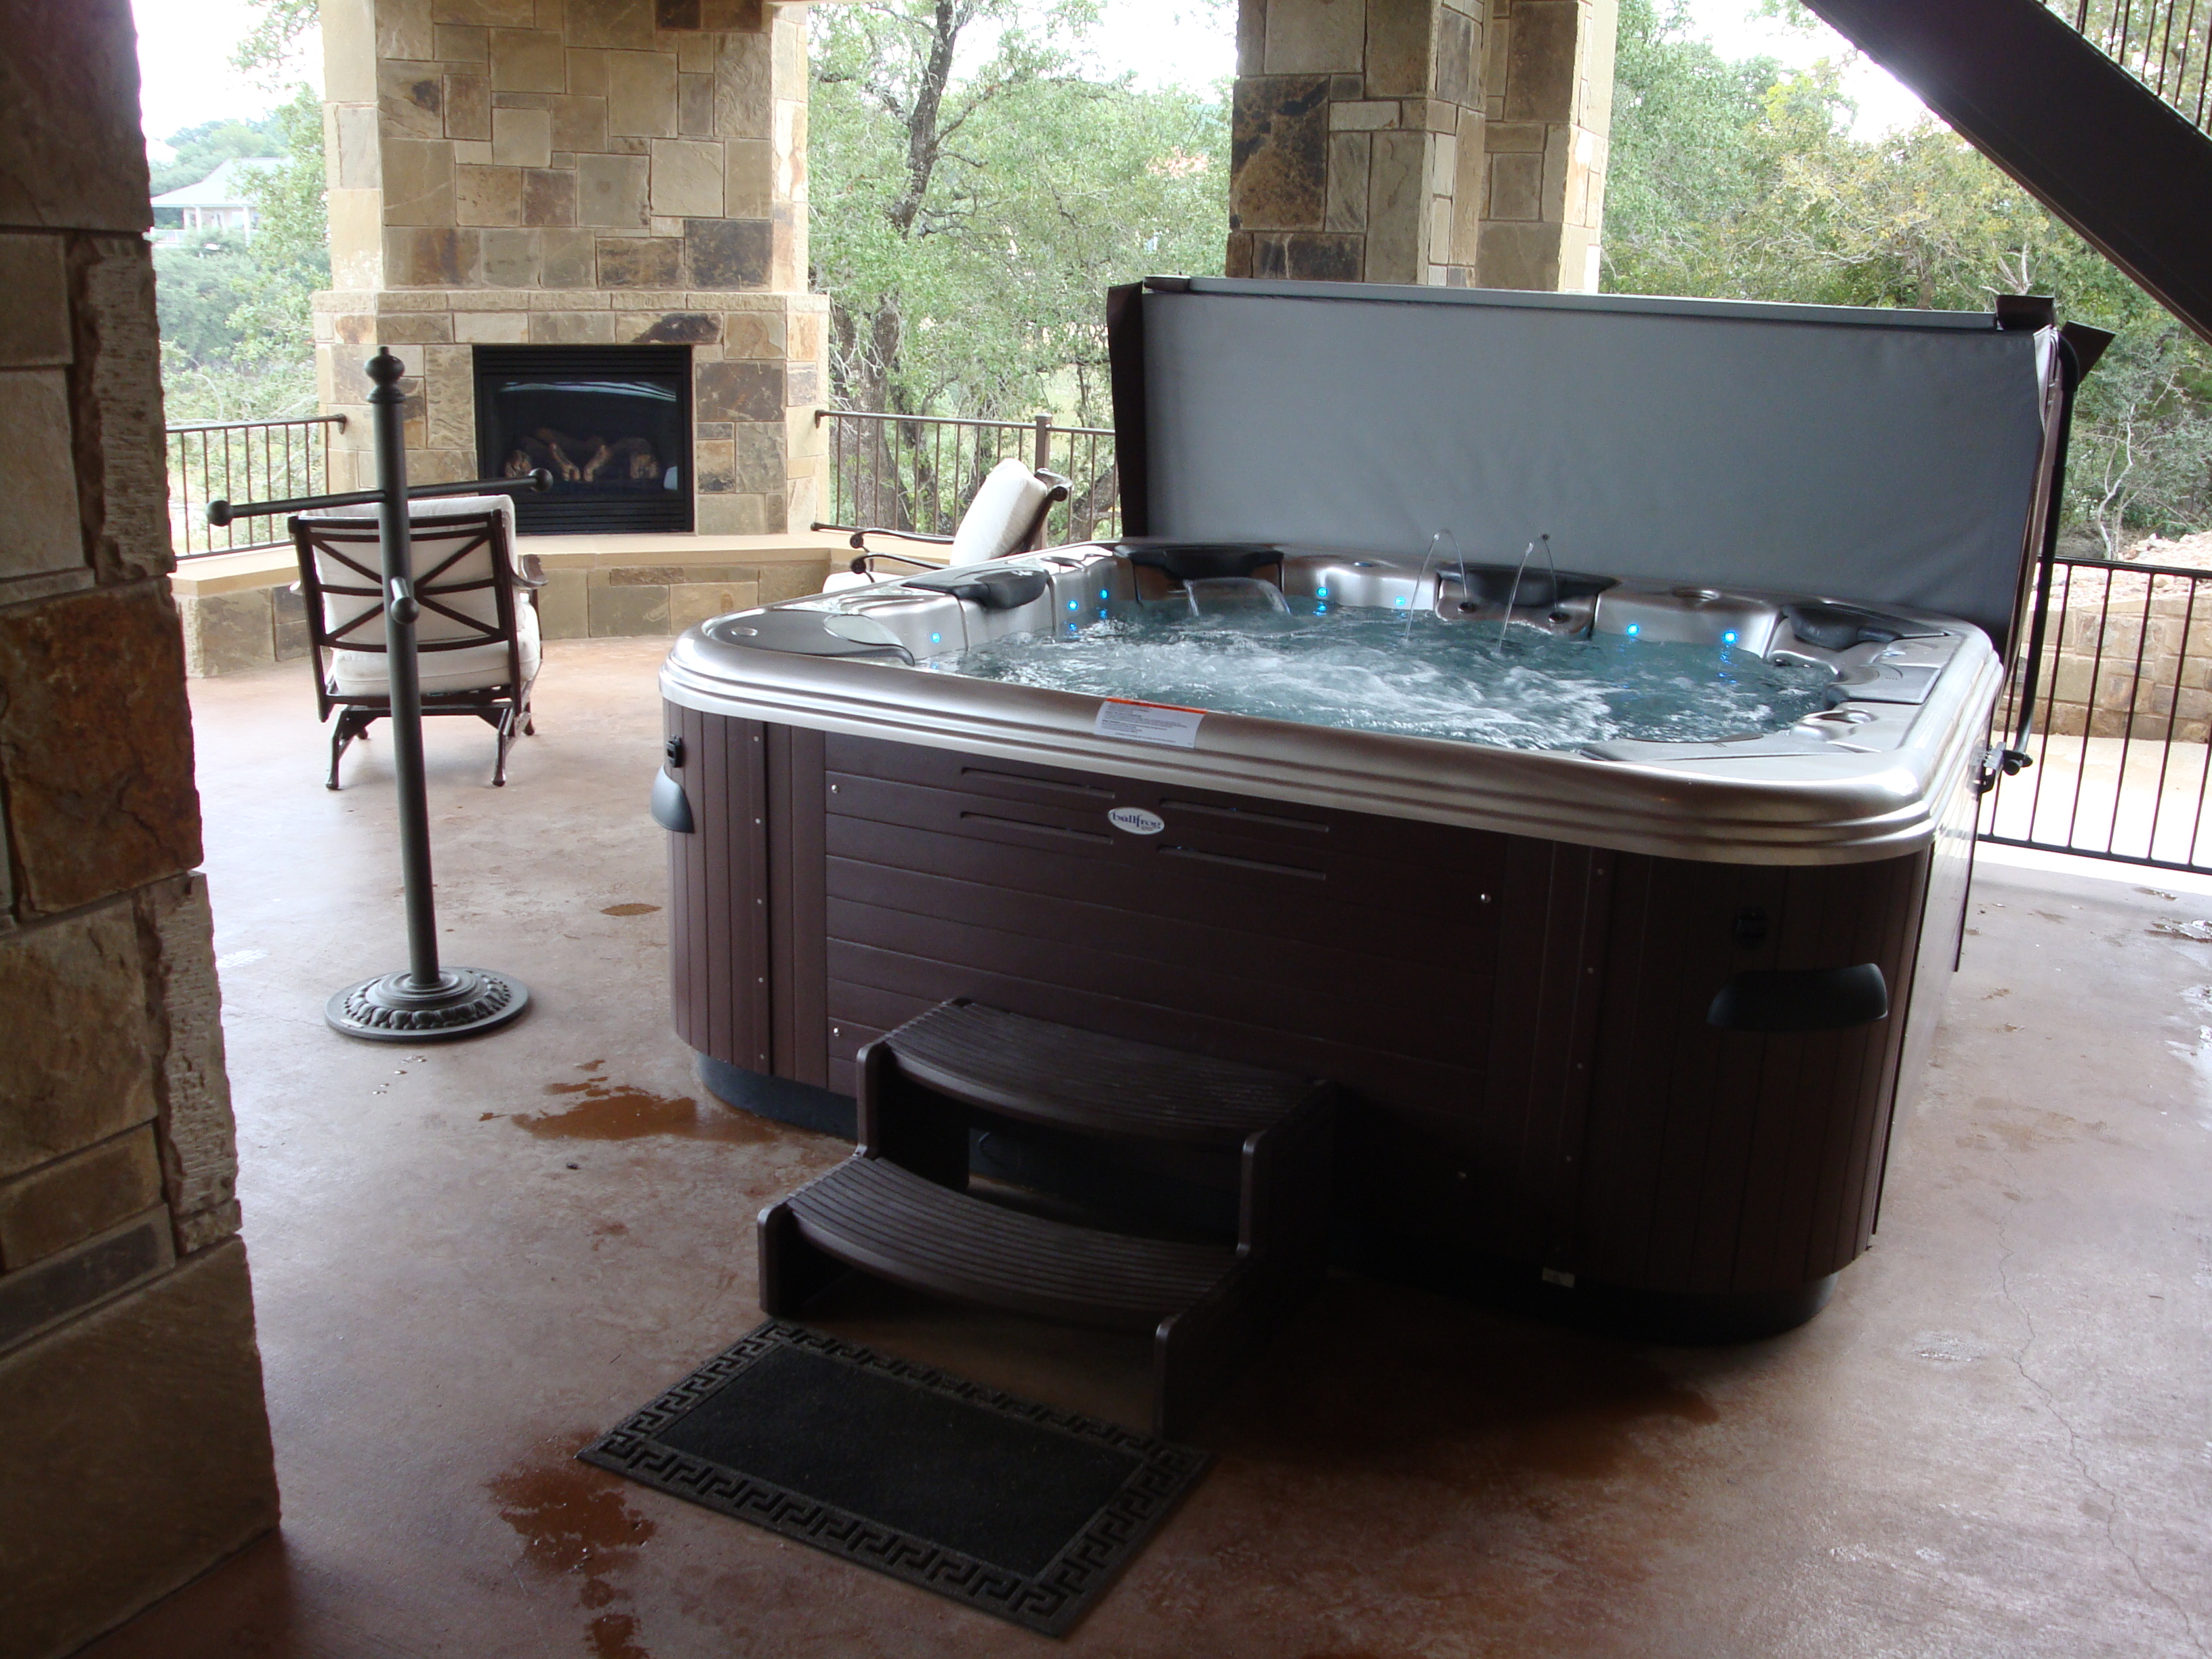 residence hydropool iberspa dream for ray qca bay series tubs saunas lakes hot leisure wonderful coast gulf hydrospa spas sale garden jacuzzi sun insparations